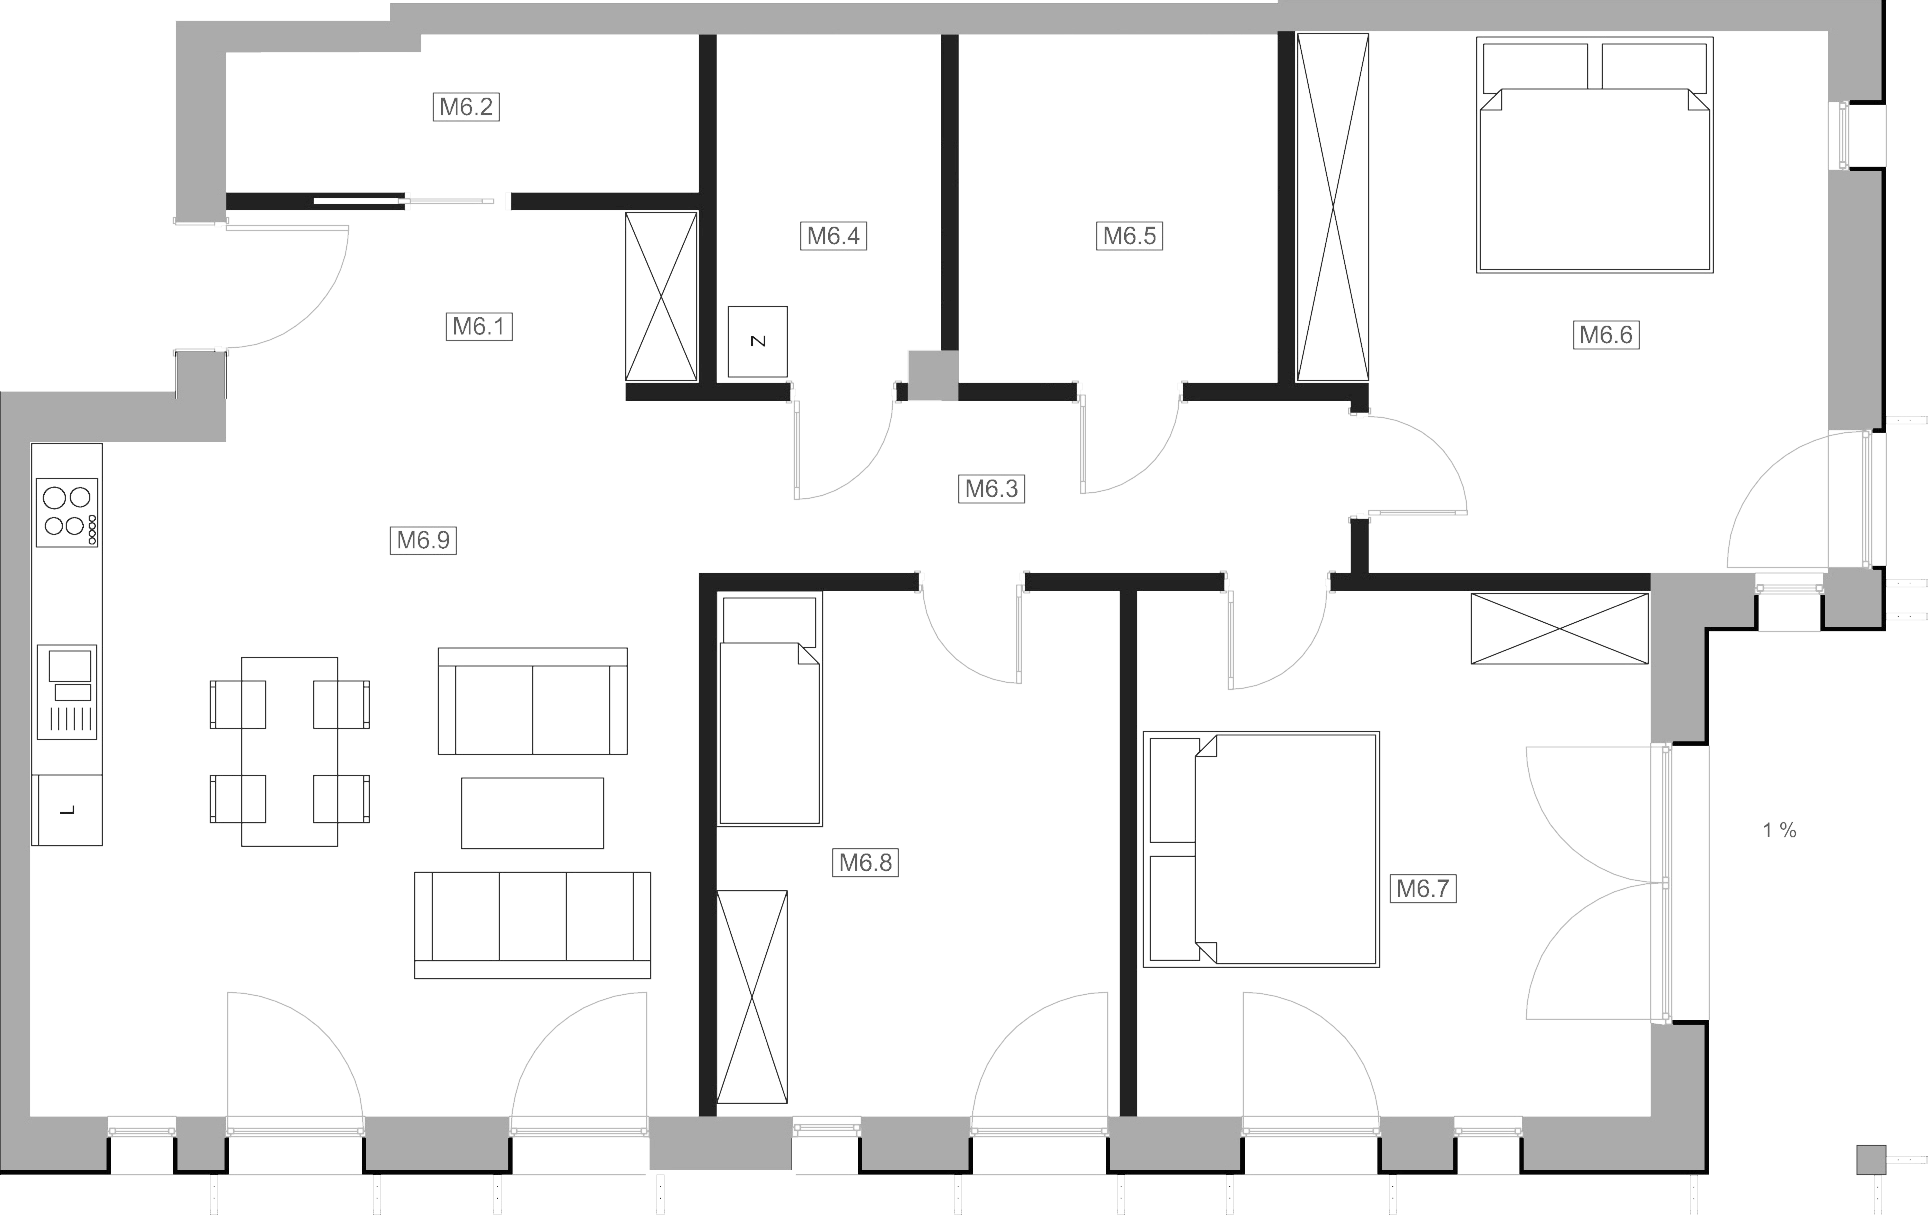 Mieszkanie M6